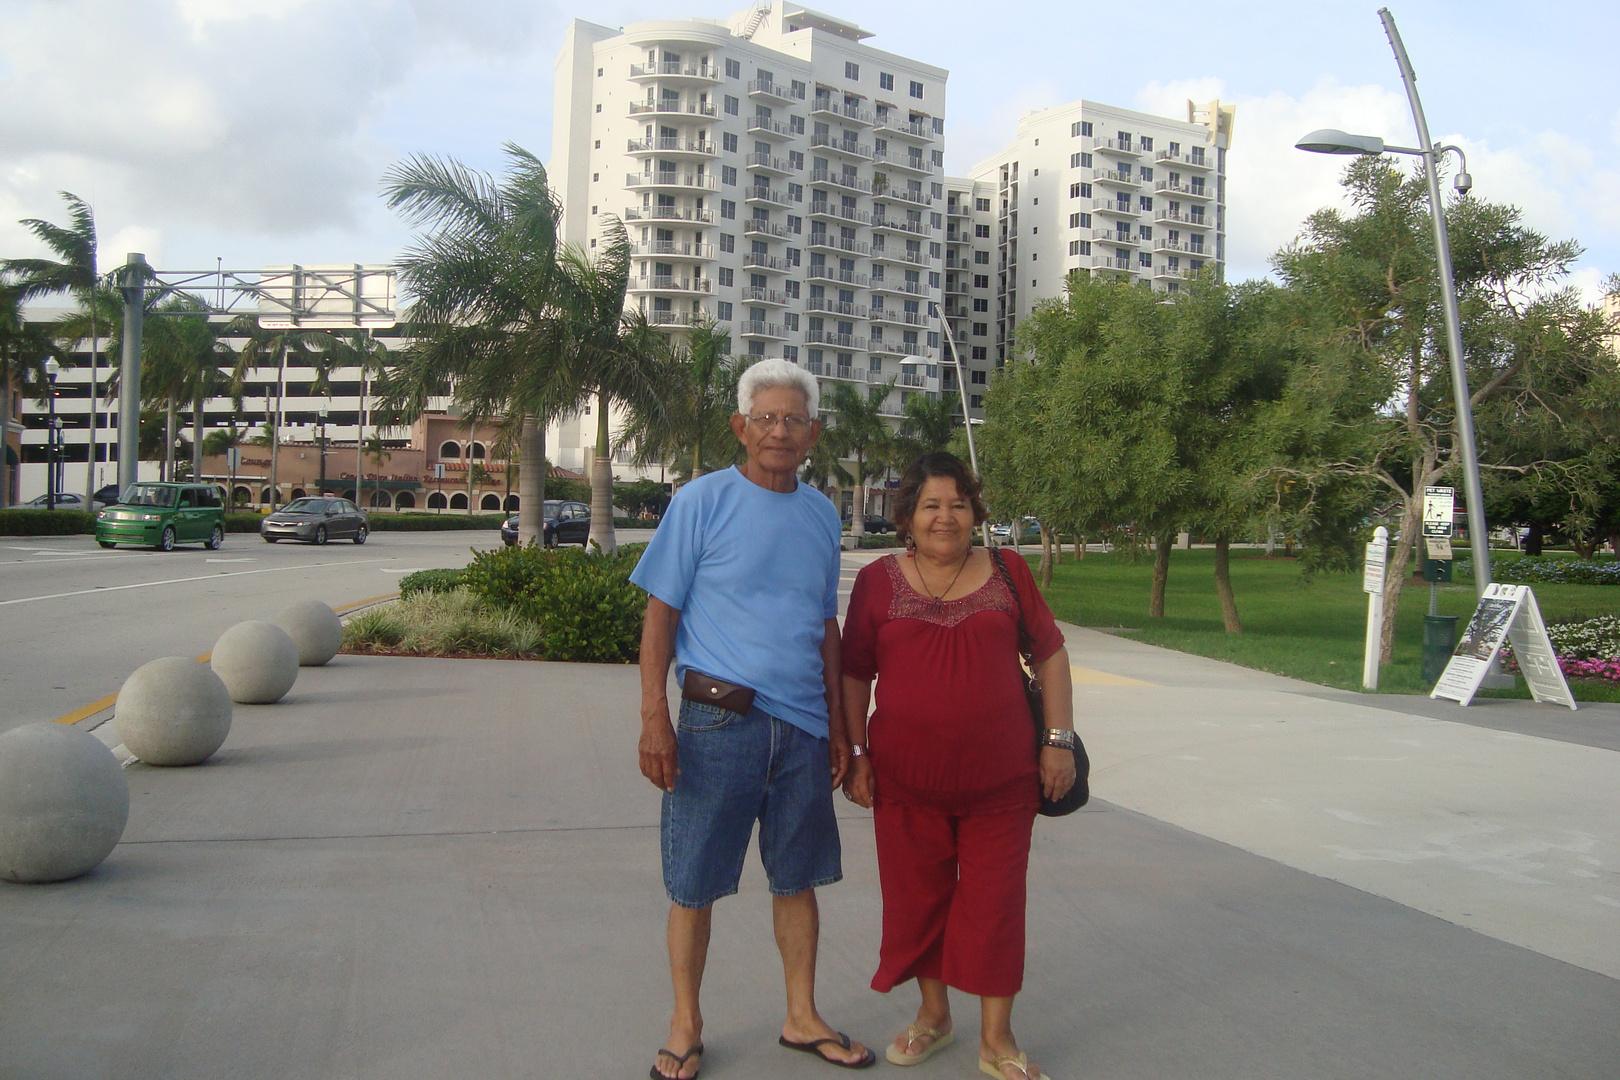 Hollyywood-Miami Fl.-EE.UU. I